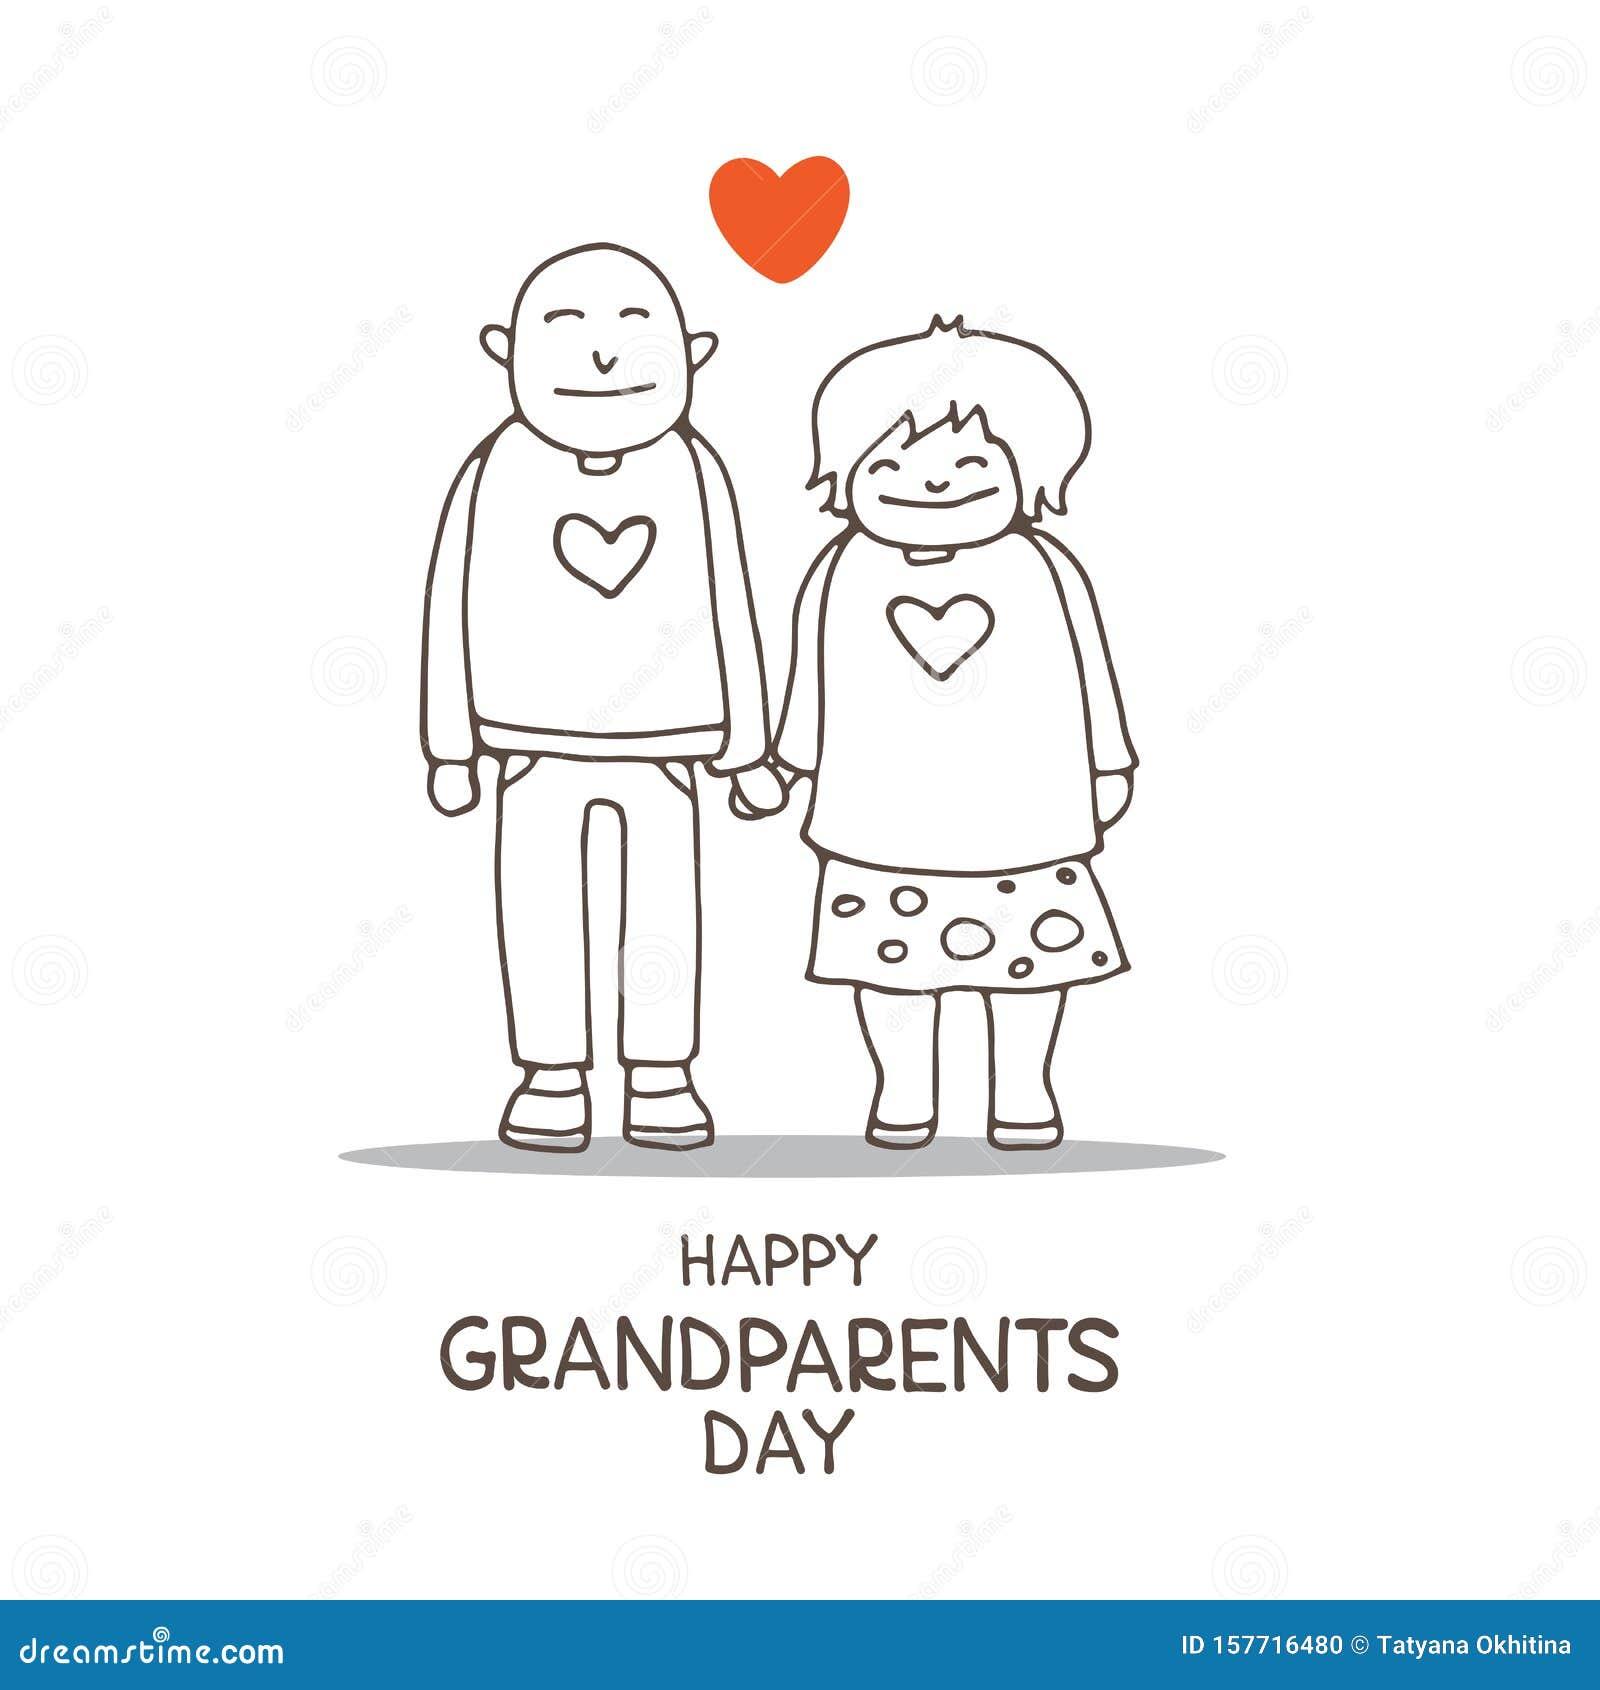 Grandparents day-10